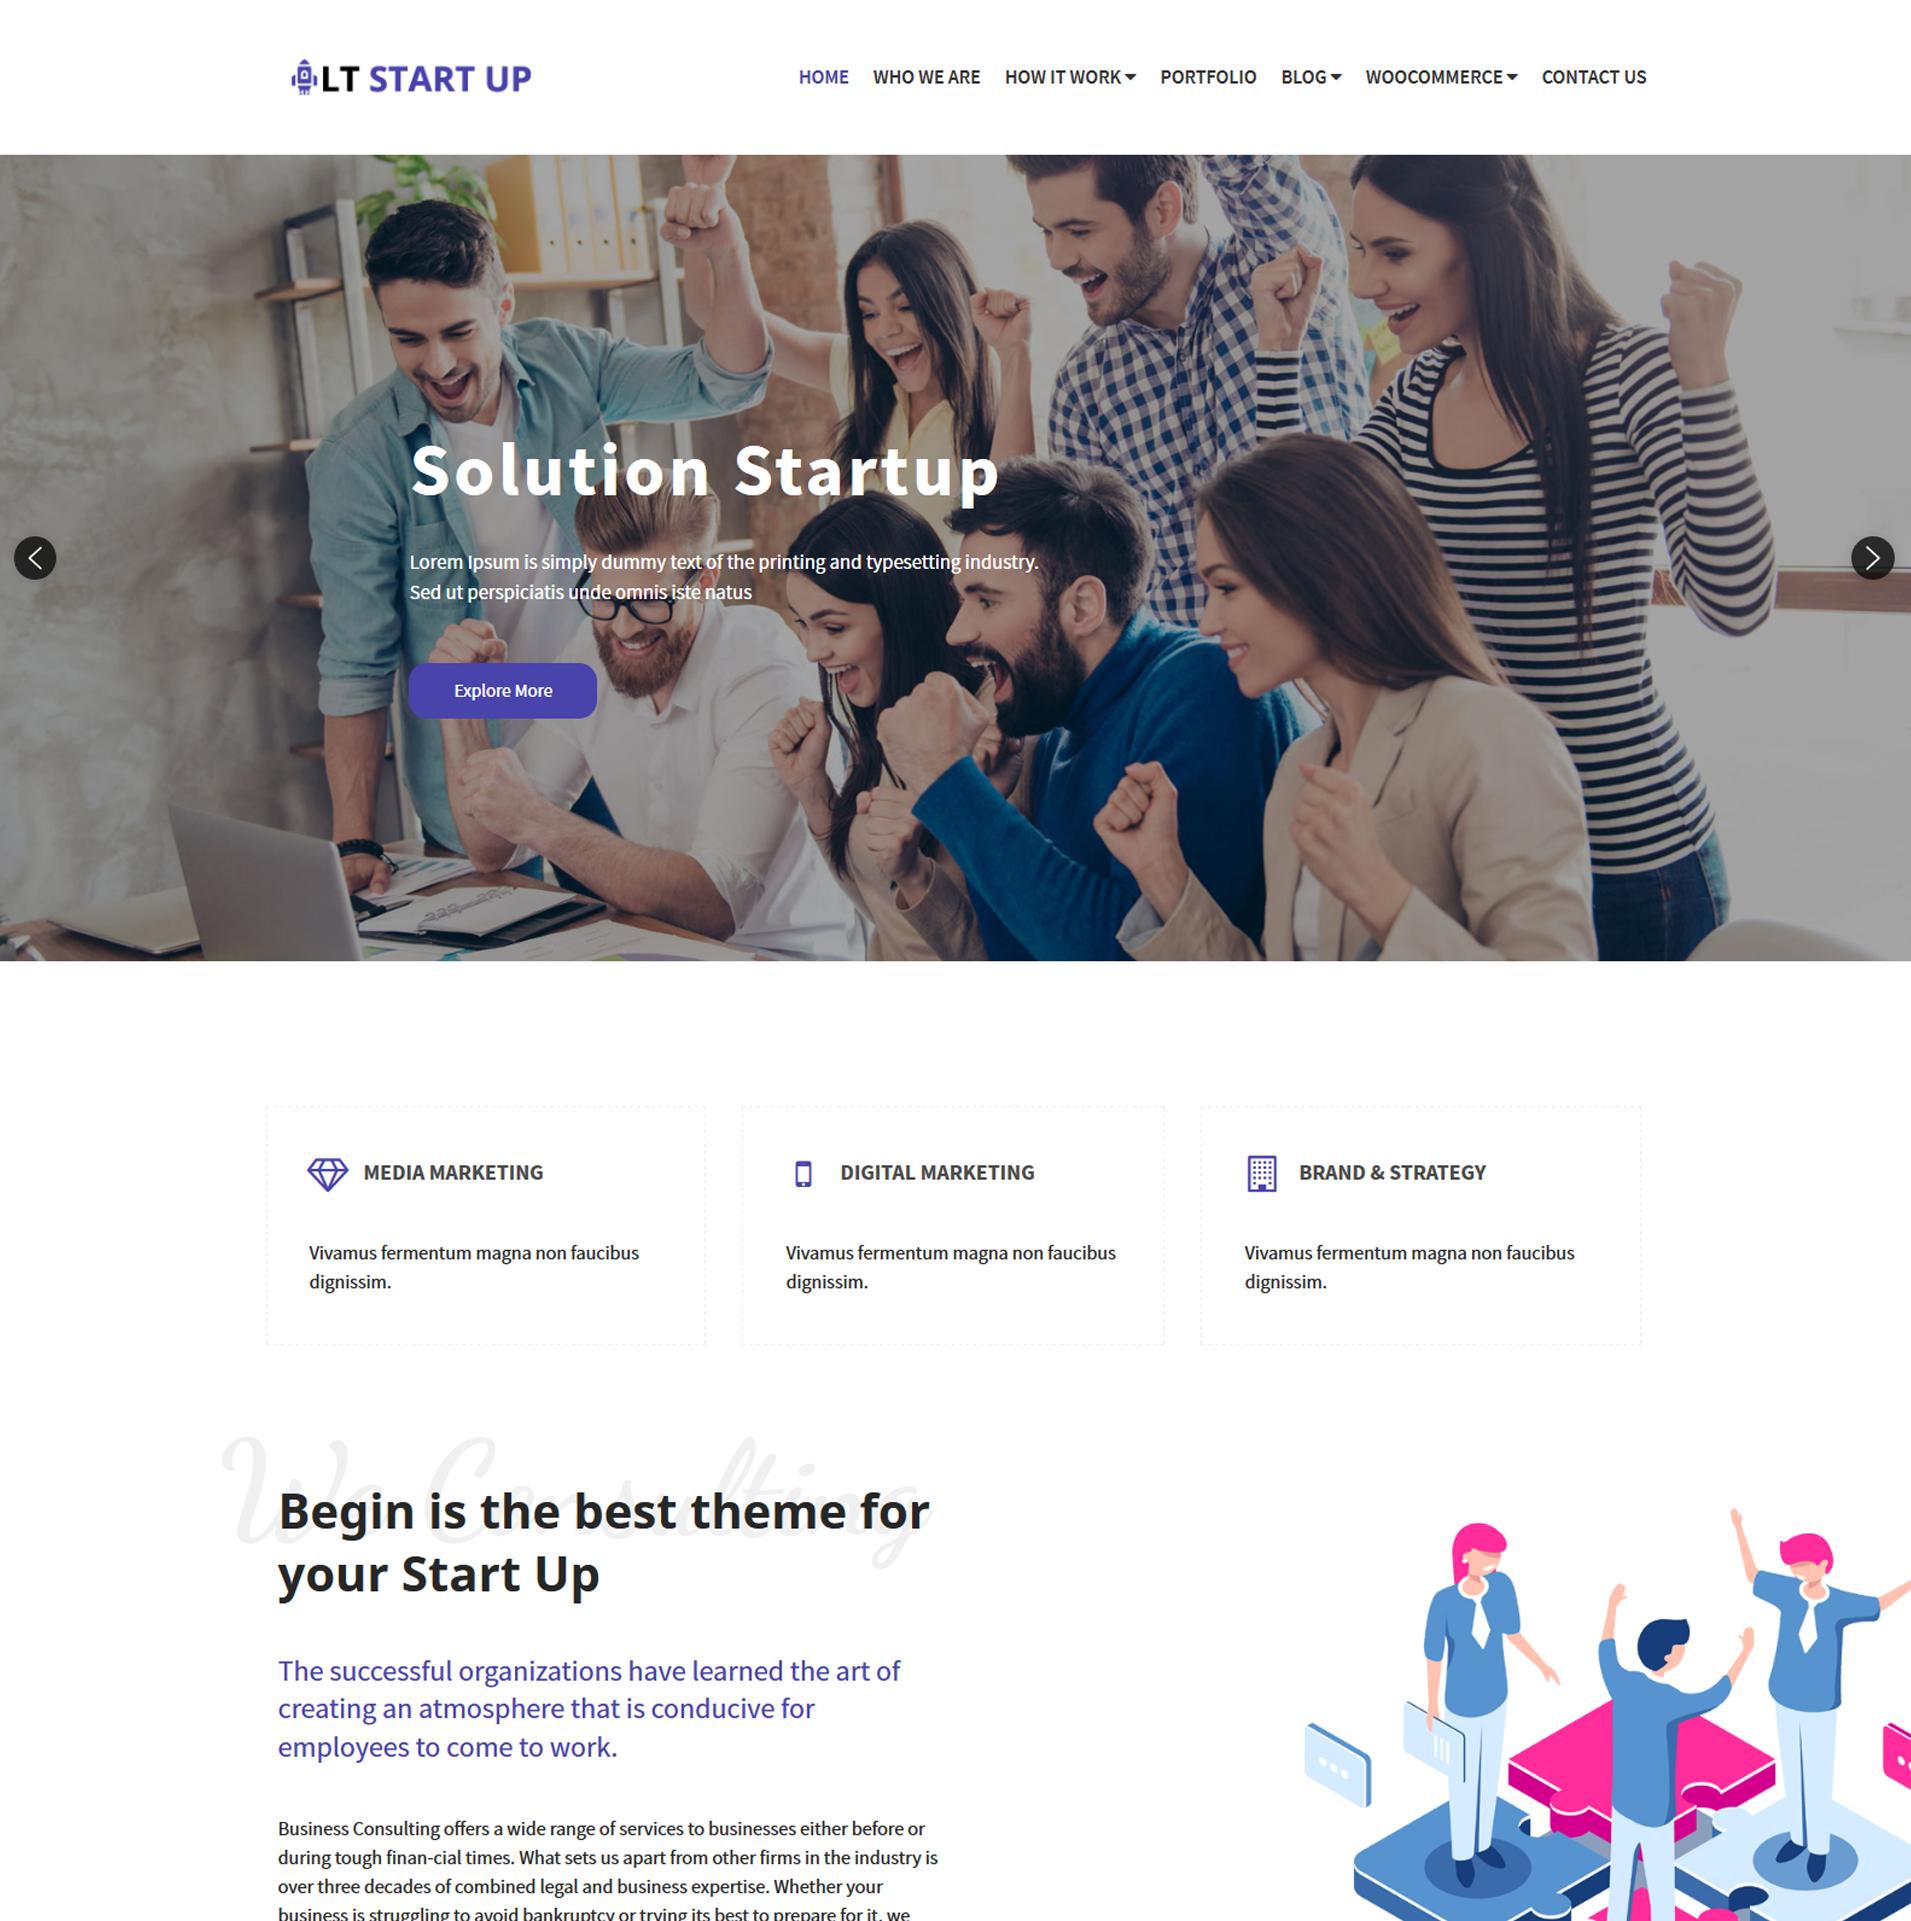 lt-startup-free-responsive-worspress-theme